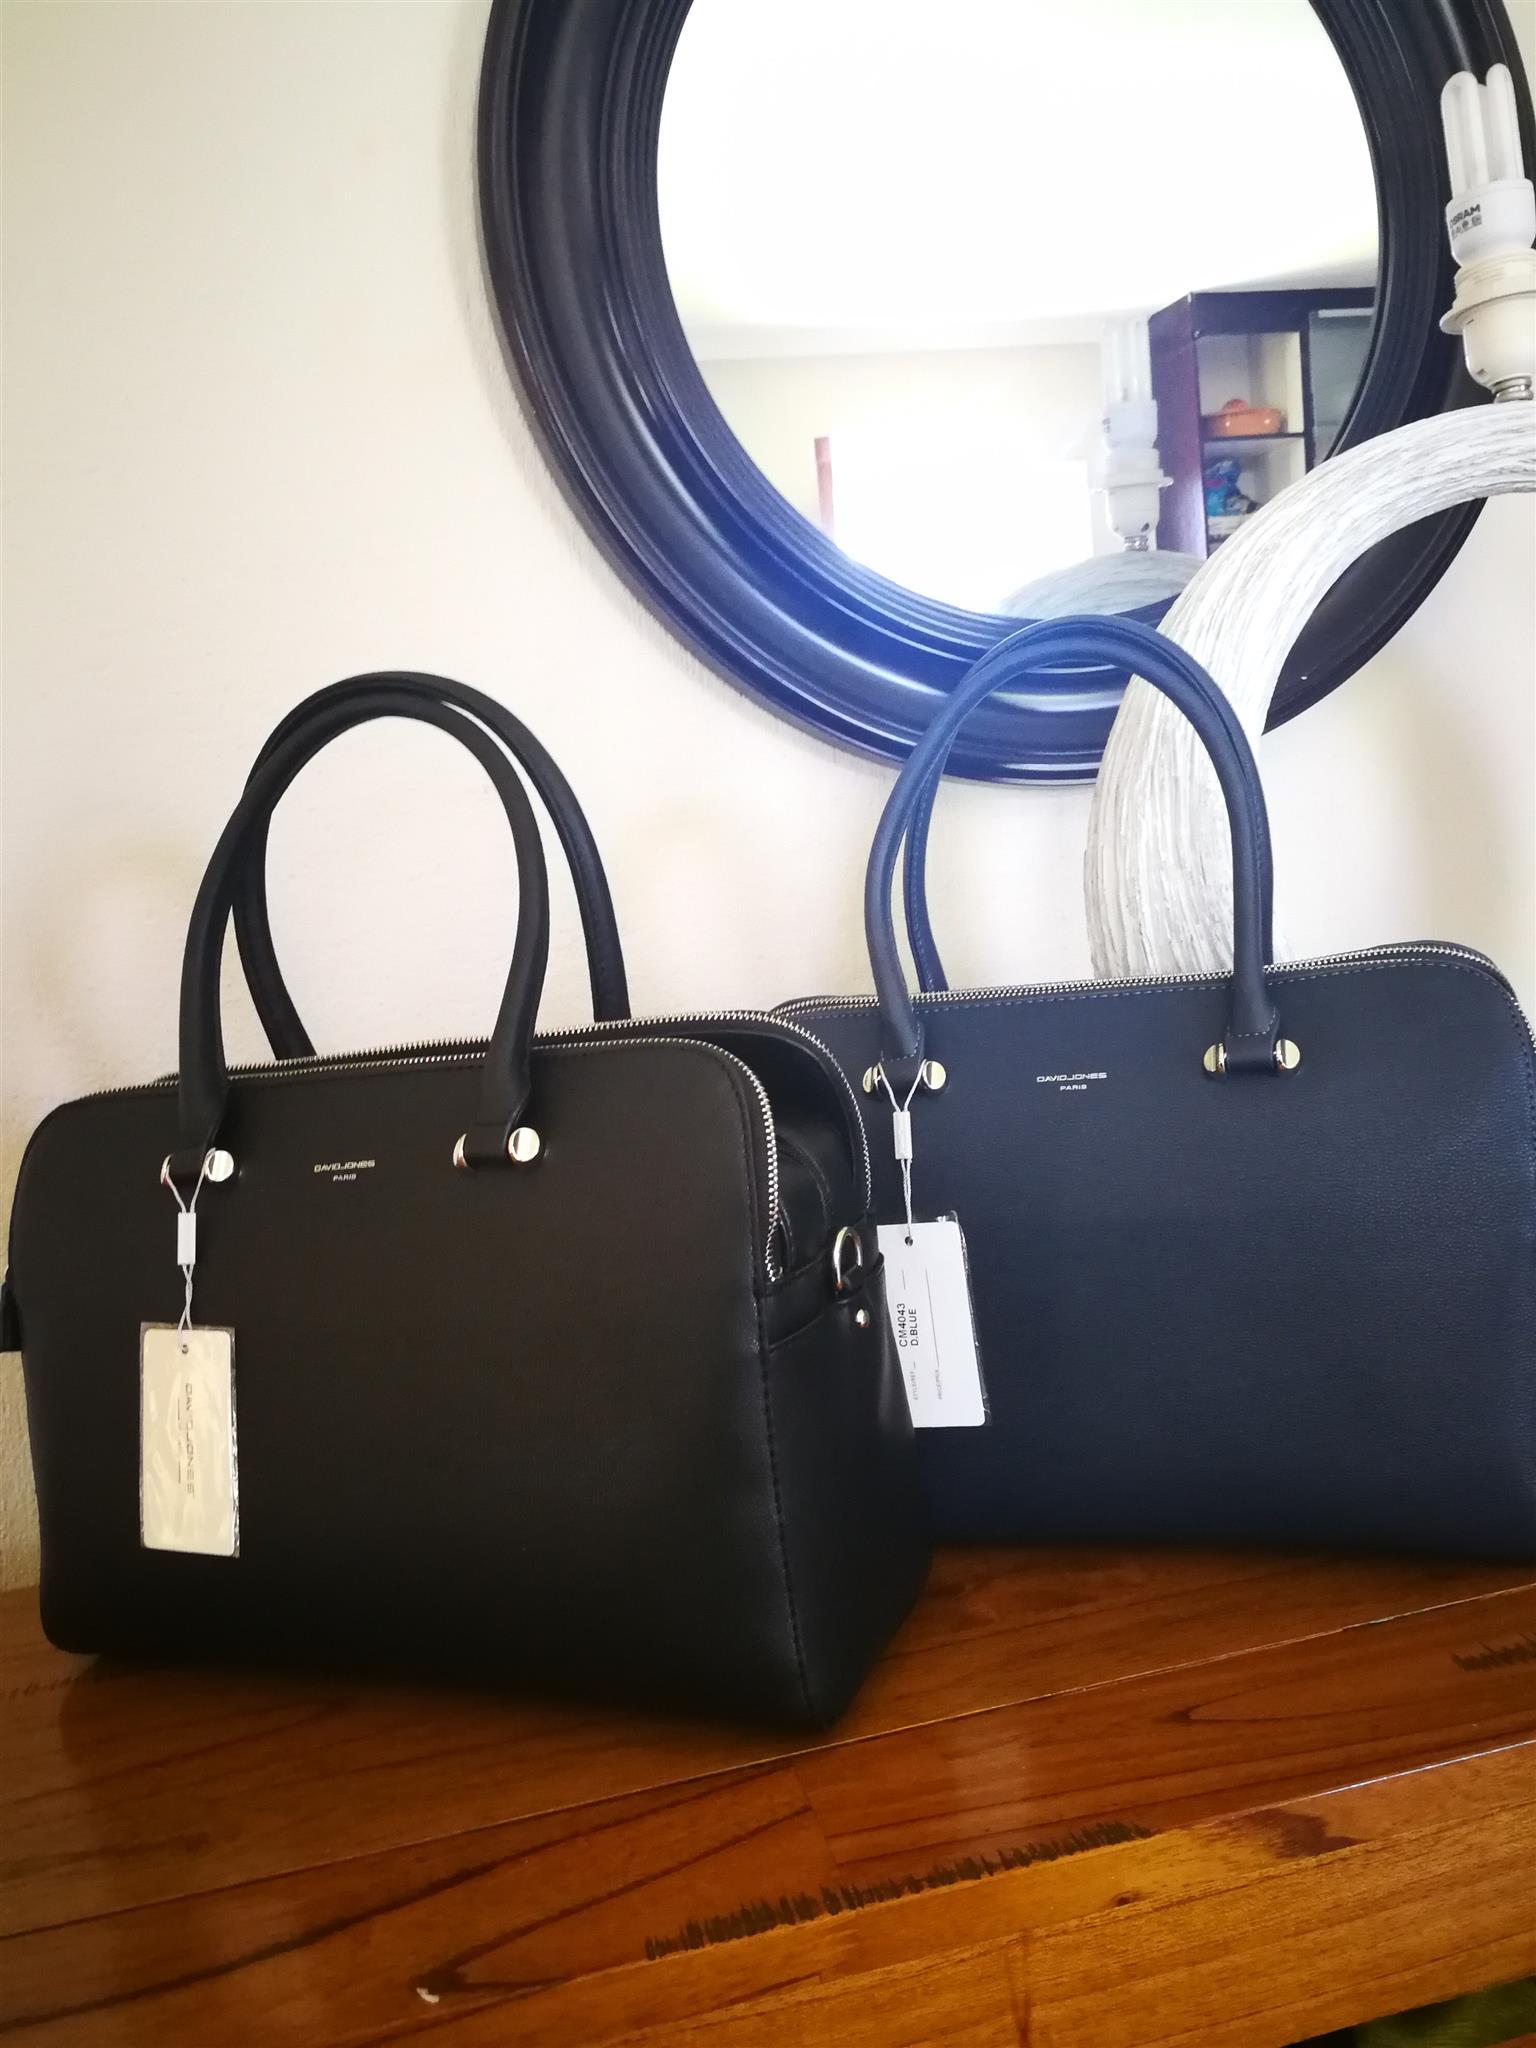 Ladies handbag for sale